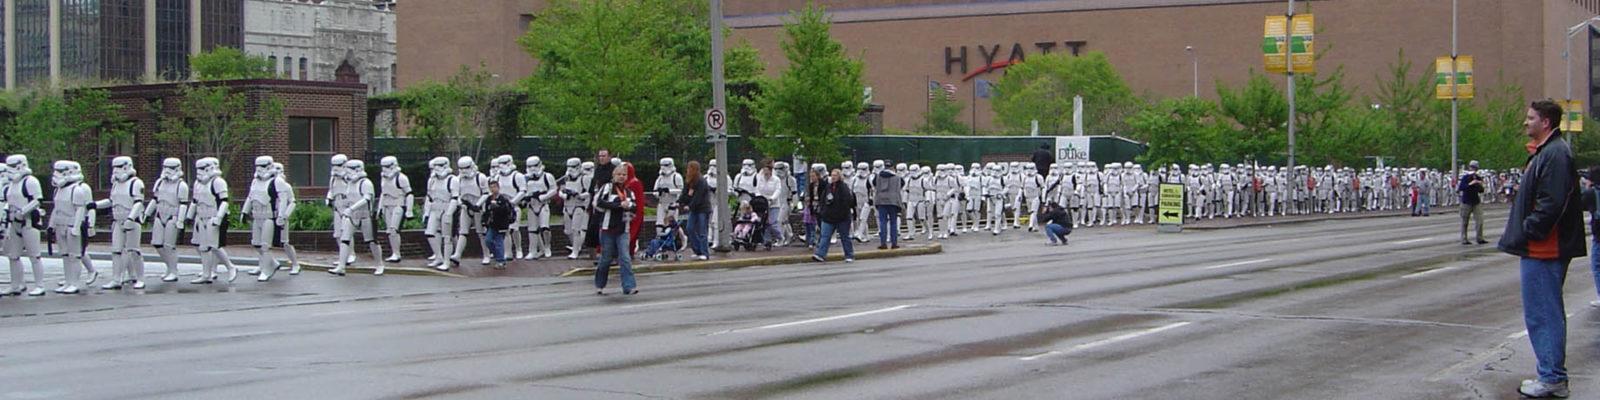 Celebration 3 - 501st Legion Stormtroopers